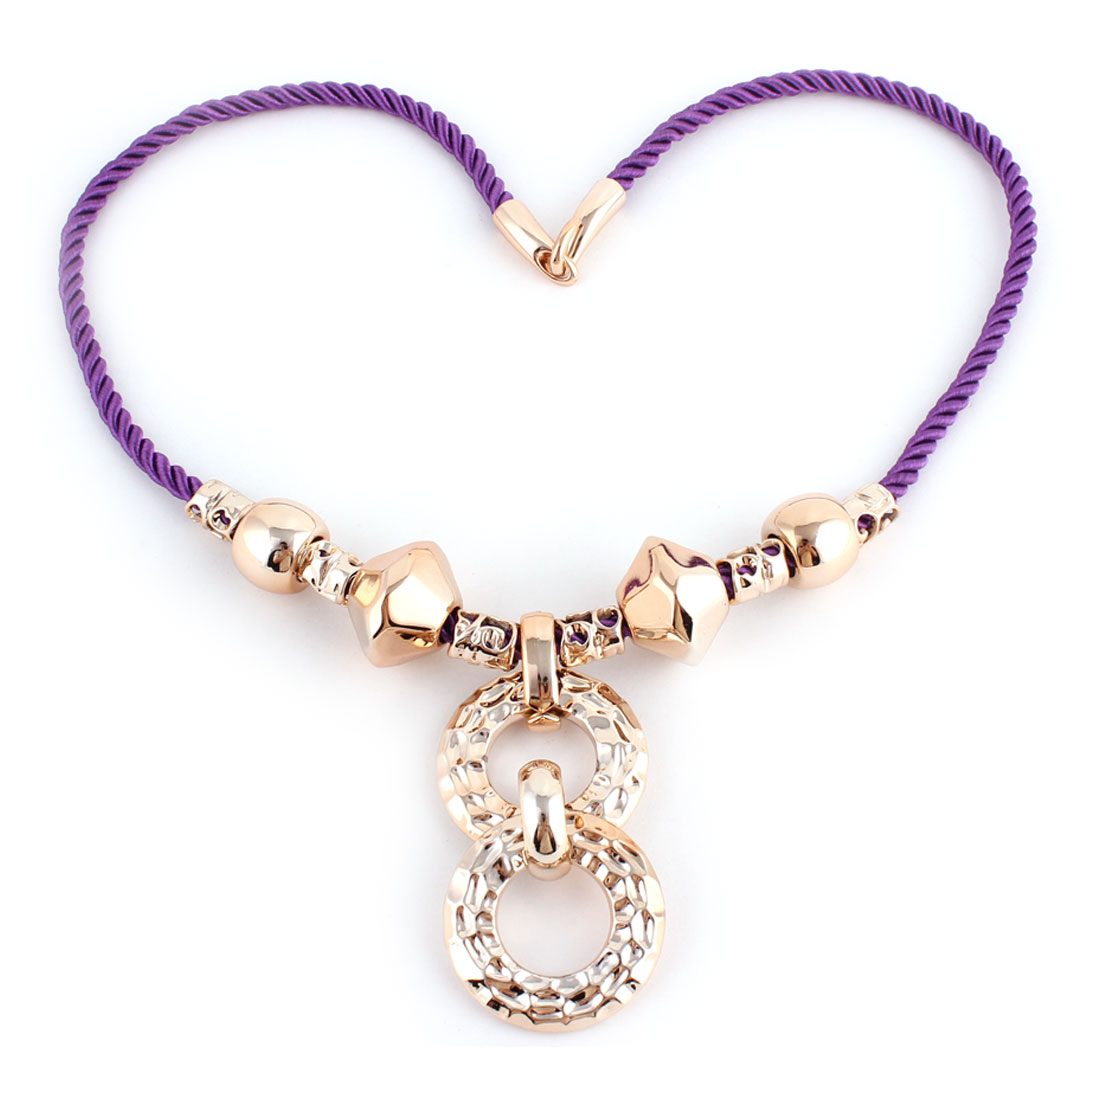 Plastic Pendant Sweater Necklace Chain Party Ornament Gold Tone Purple